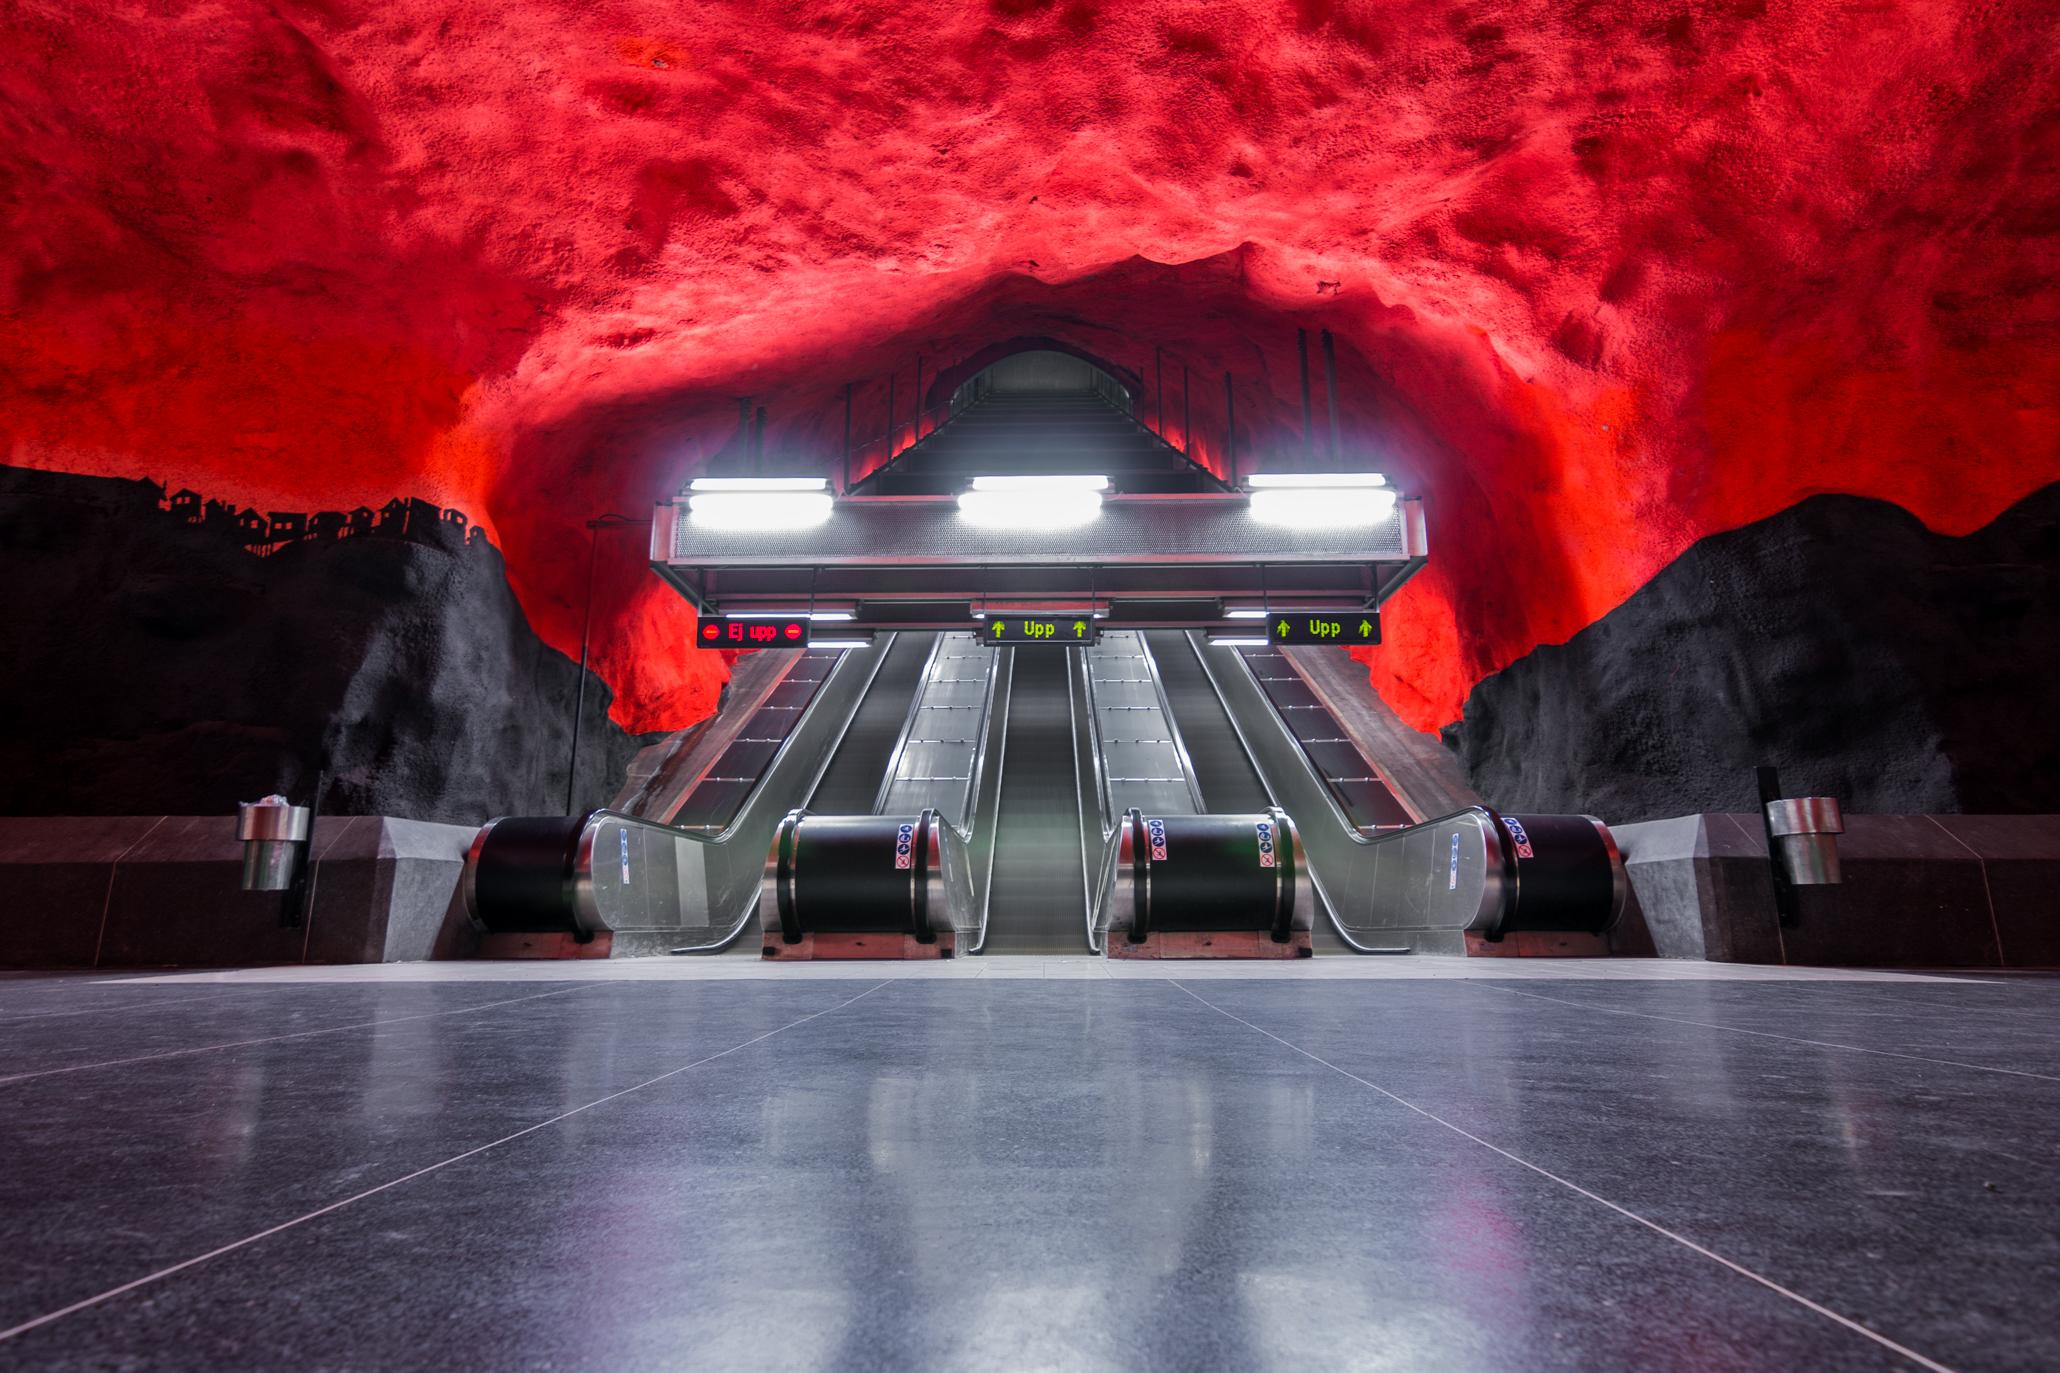 solna+tunnelbana+stockholm+art+subway